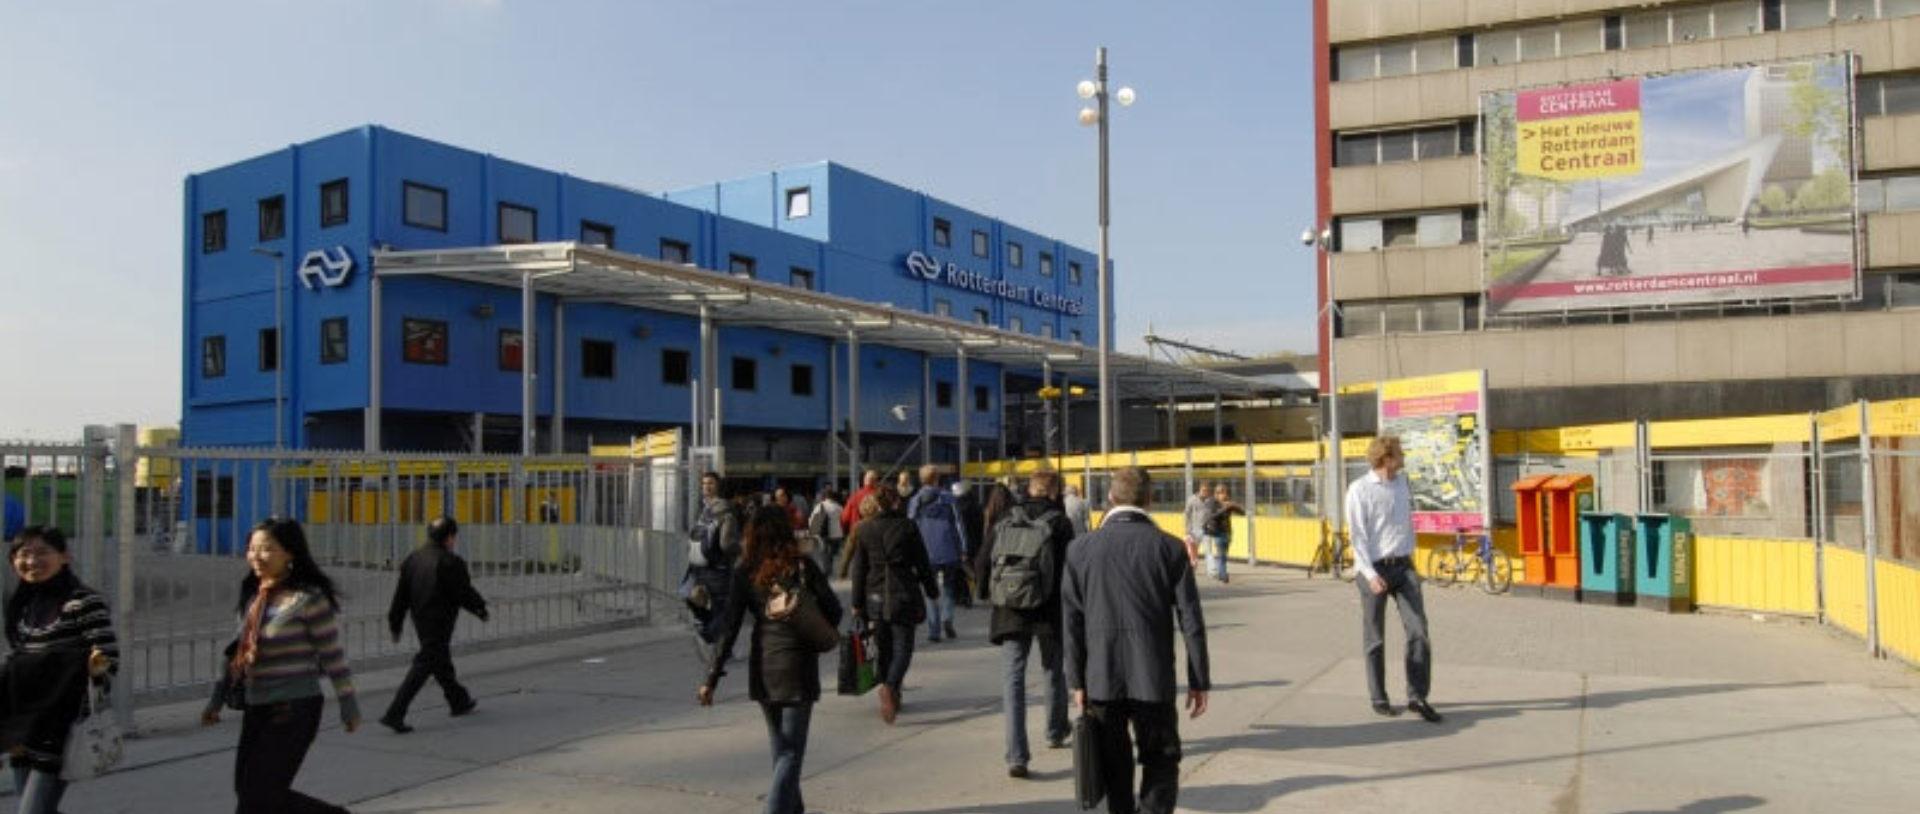 Centraal station Rotterdam 01